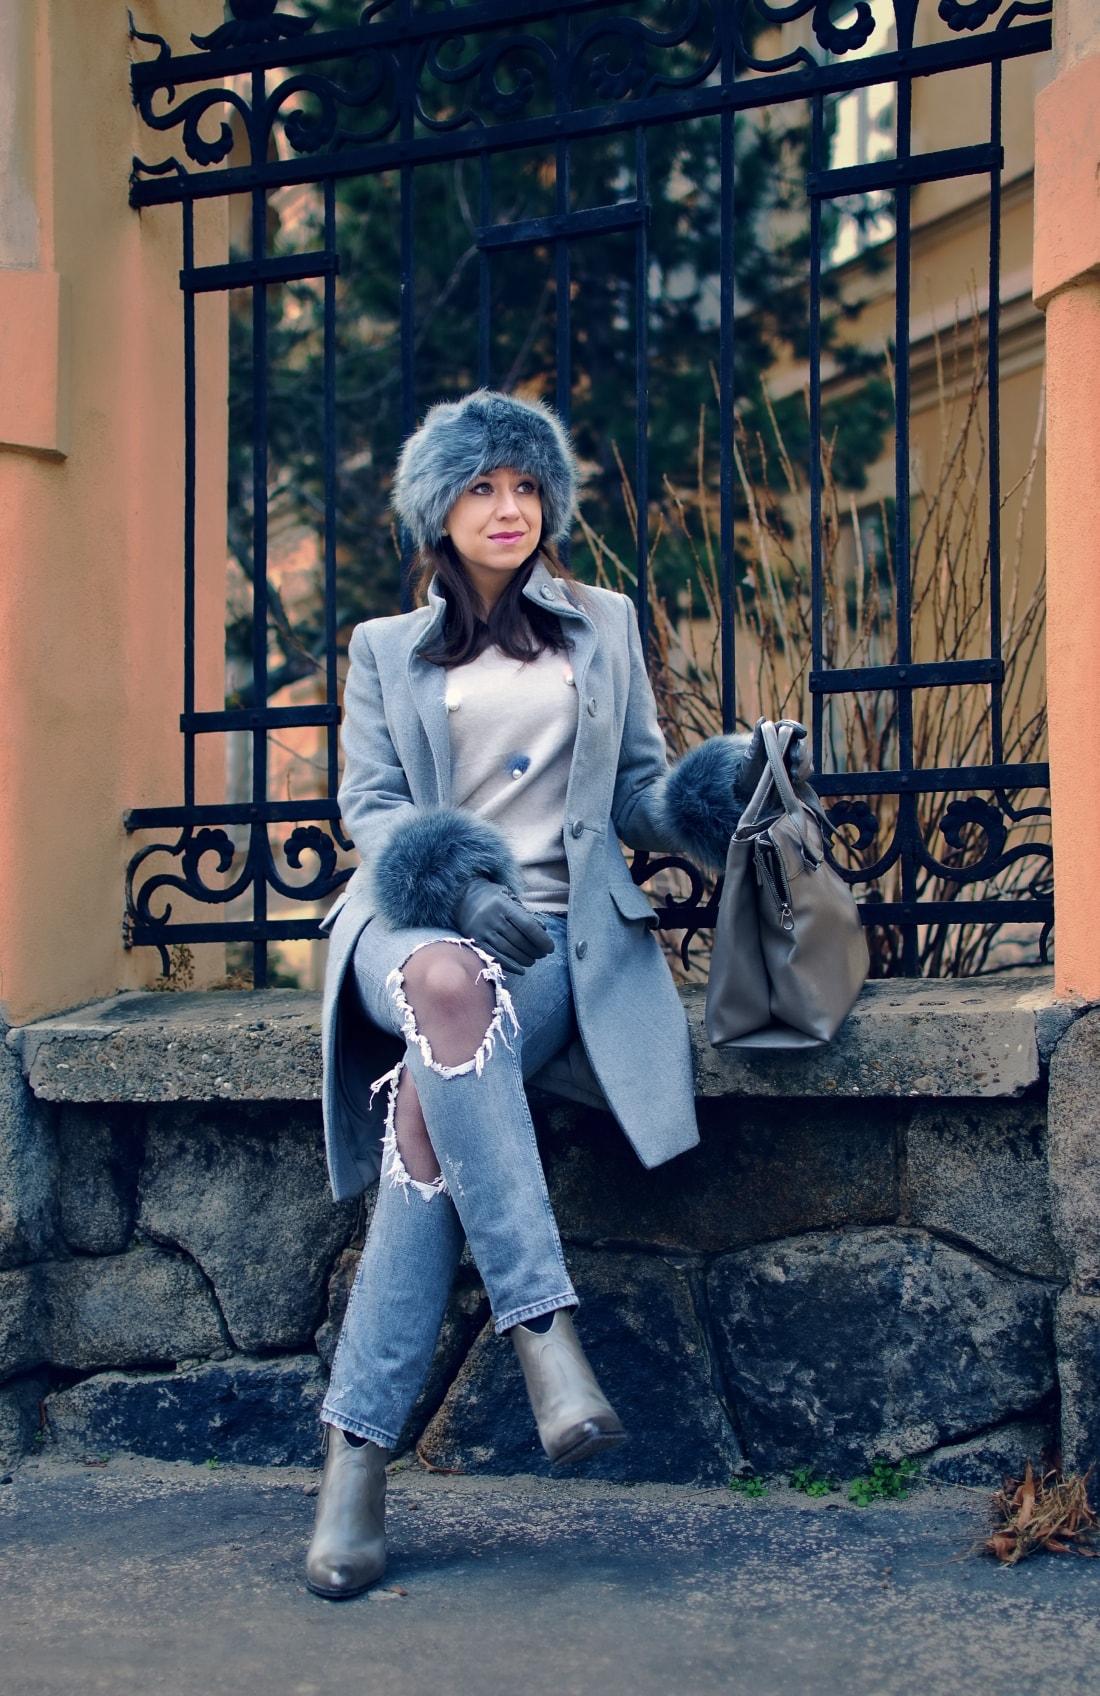 Kožušinové doplnky_Katharine-fashion is beautiful_blog 3_Sivý kabát_Roztrhané džínsy Zara_Katarína Jakubčová_Fashion blogger